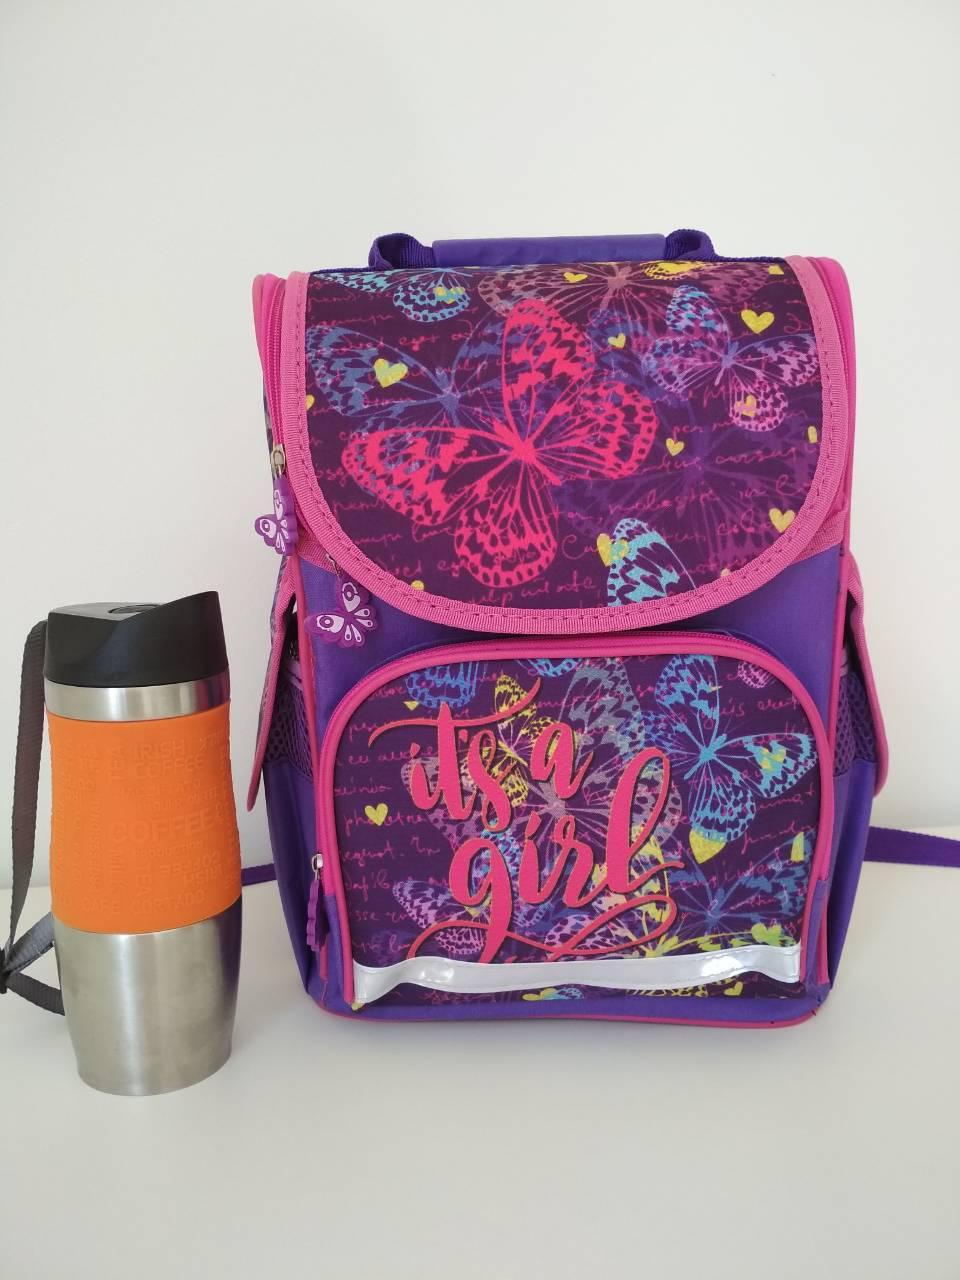 Рюкзак каркасный Бабочки для девочки 1-4 класса размер 33х26х16